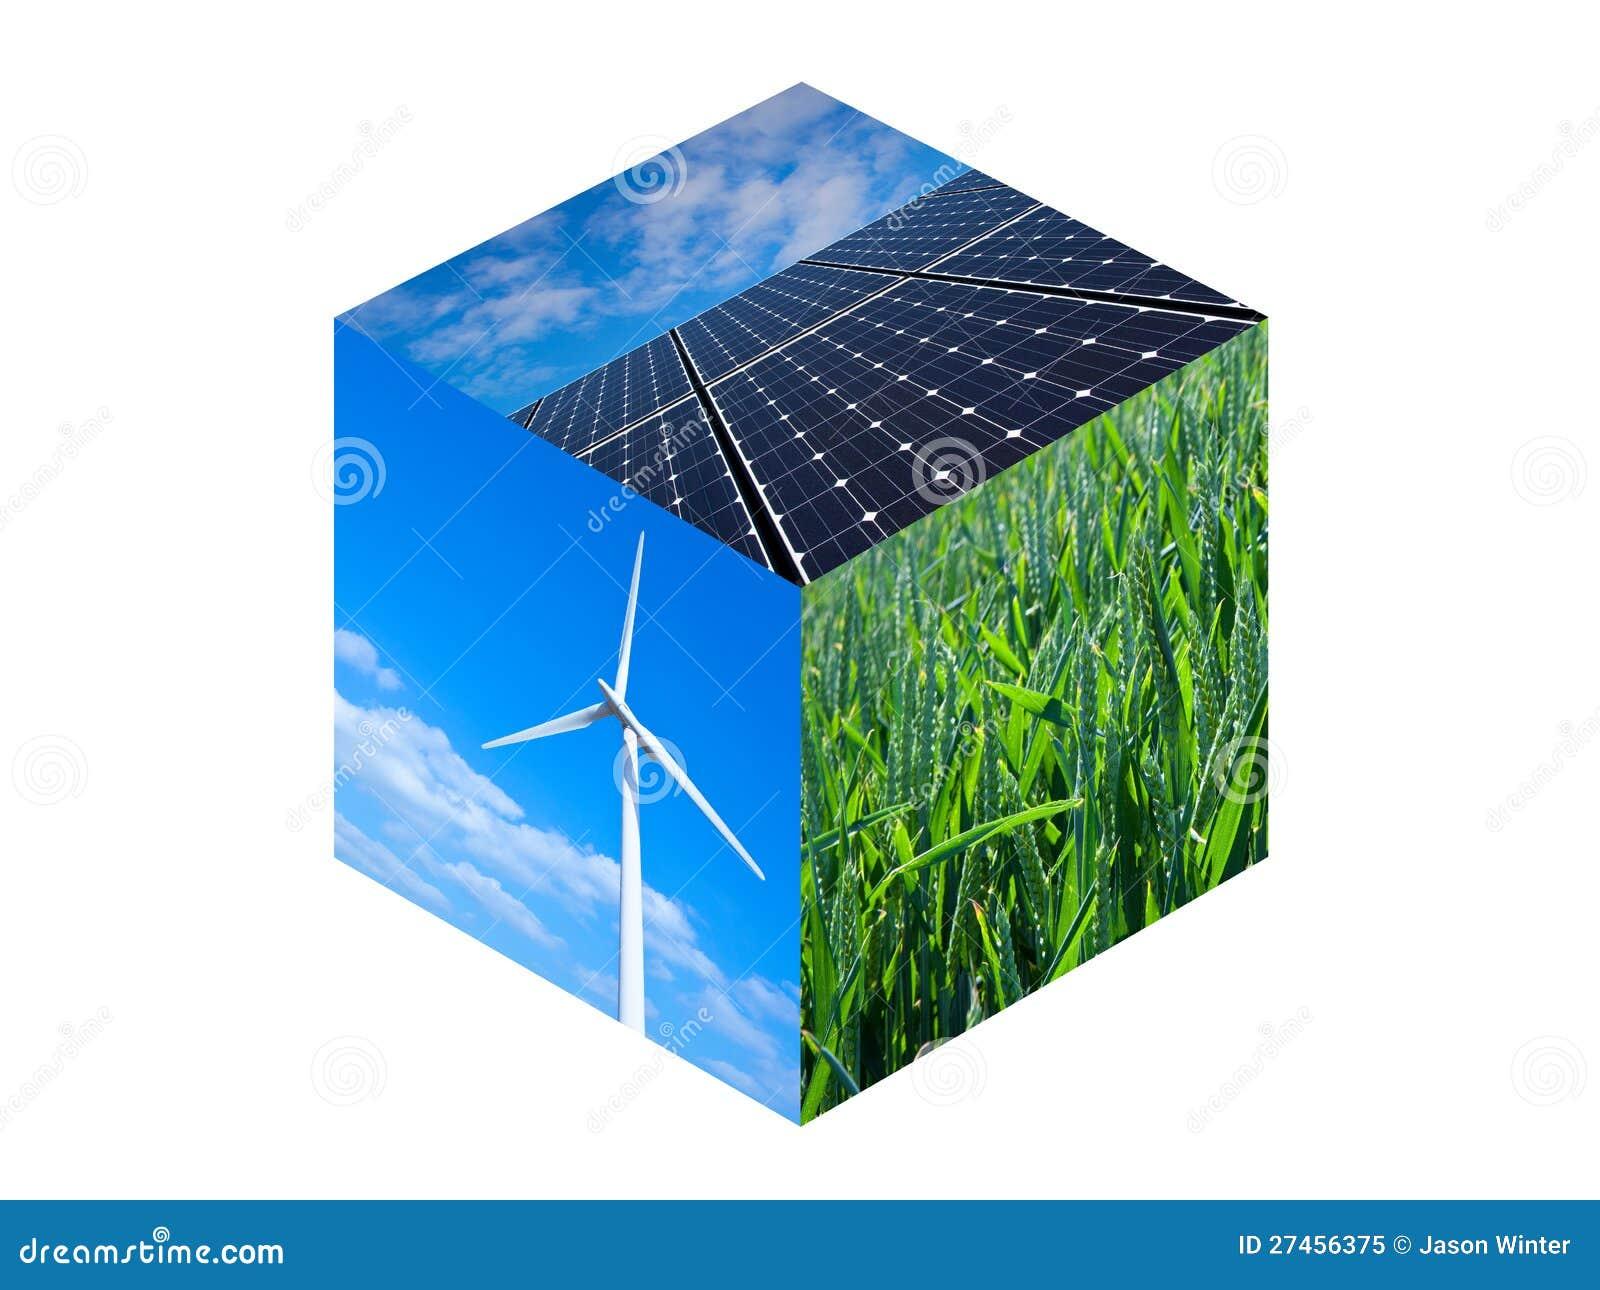 Renewable Energy Cube